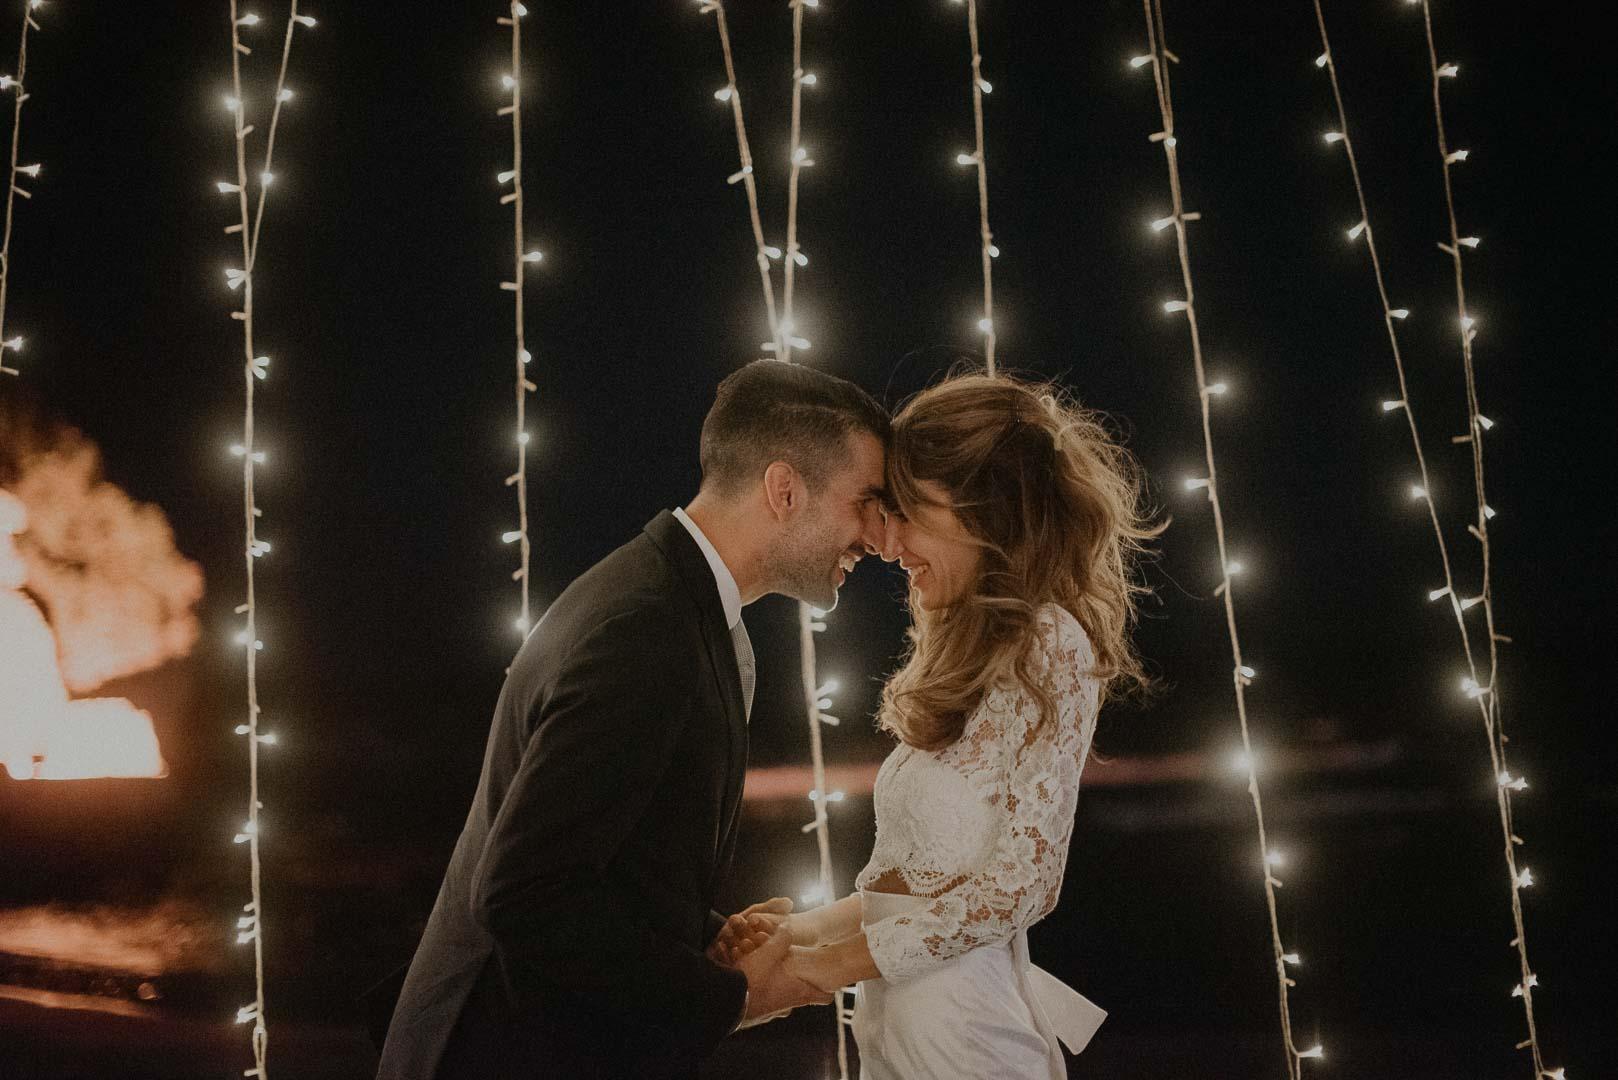 wedding-photographer-destination-fineart-bespoke-reportage-napoli-nabilah-vivianeizzo-spazio46-183